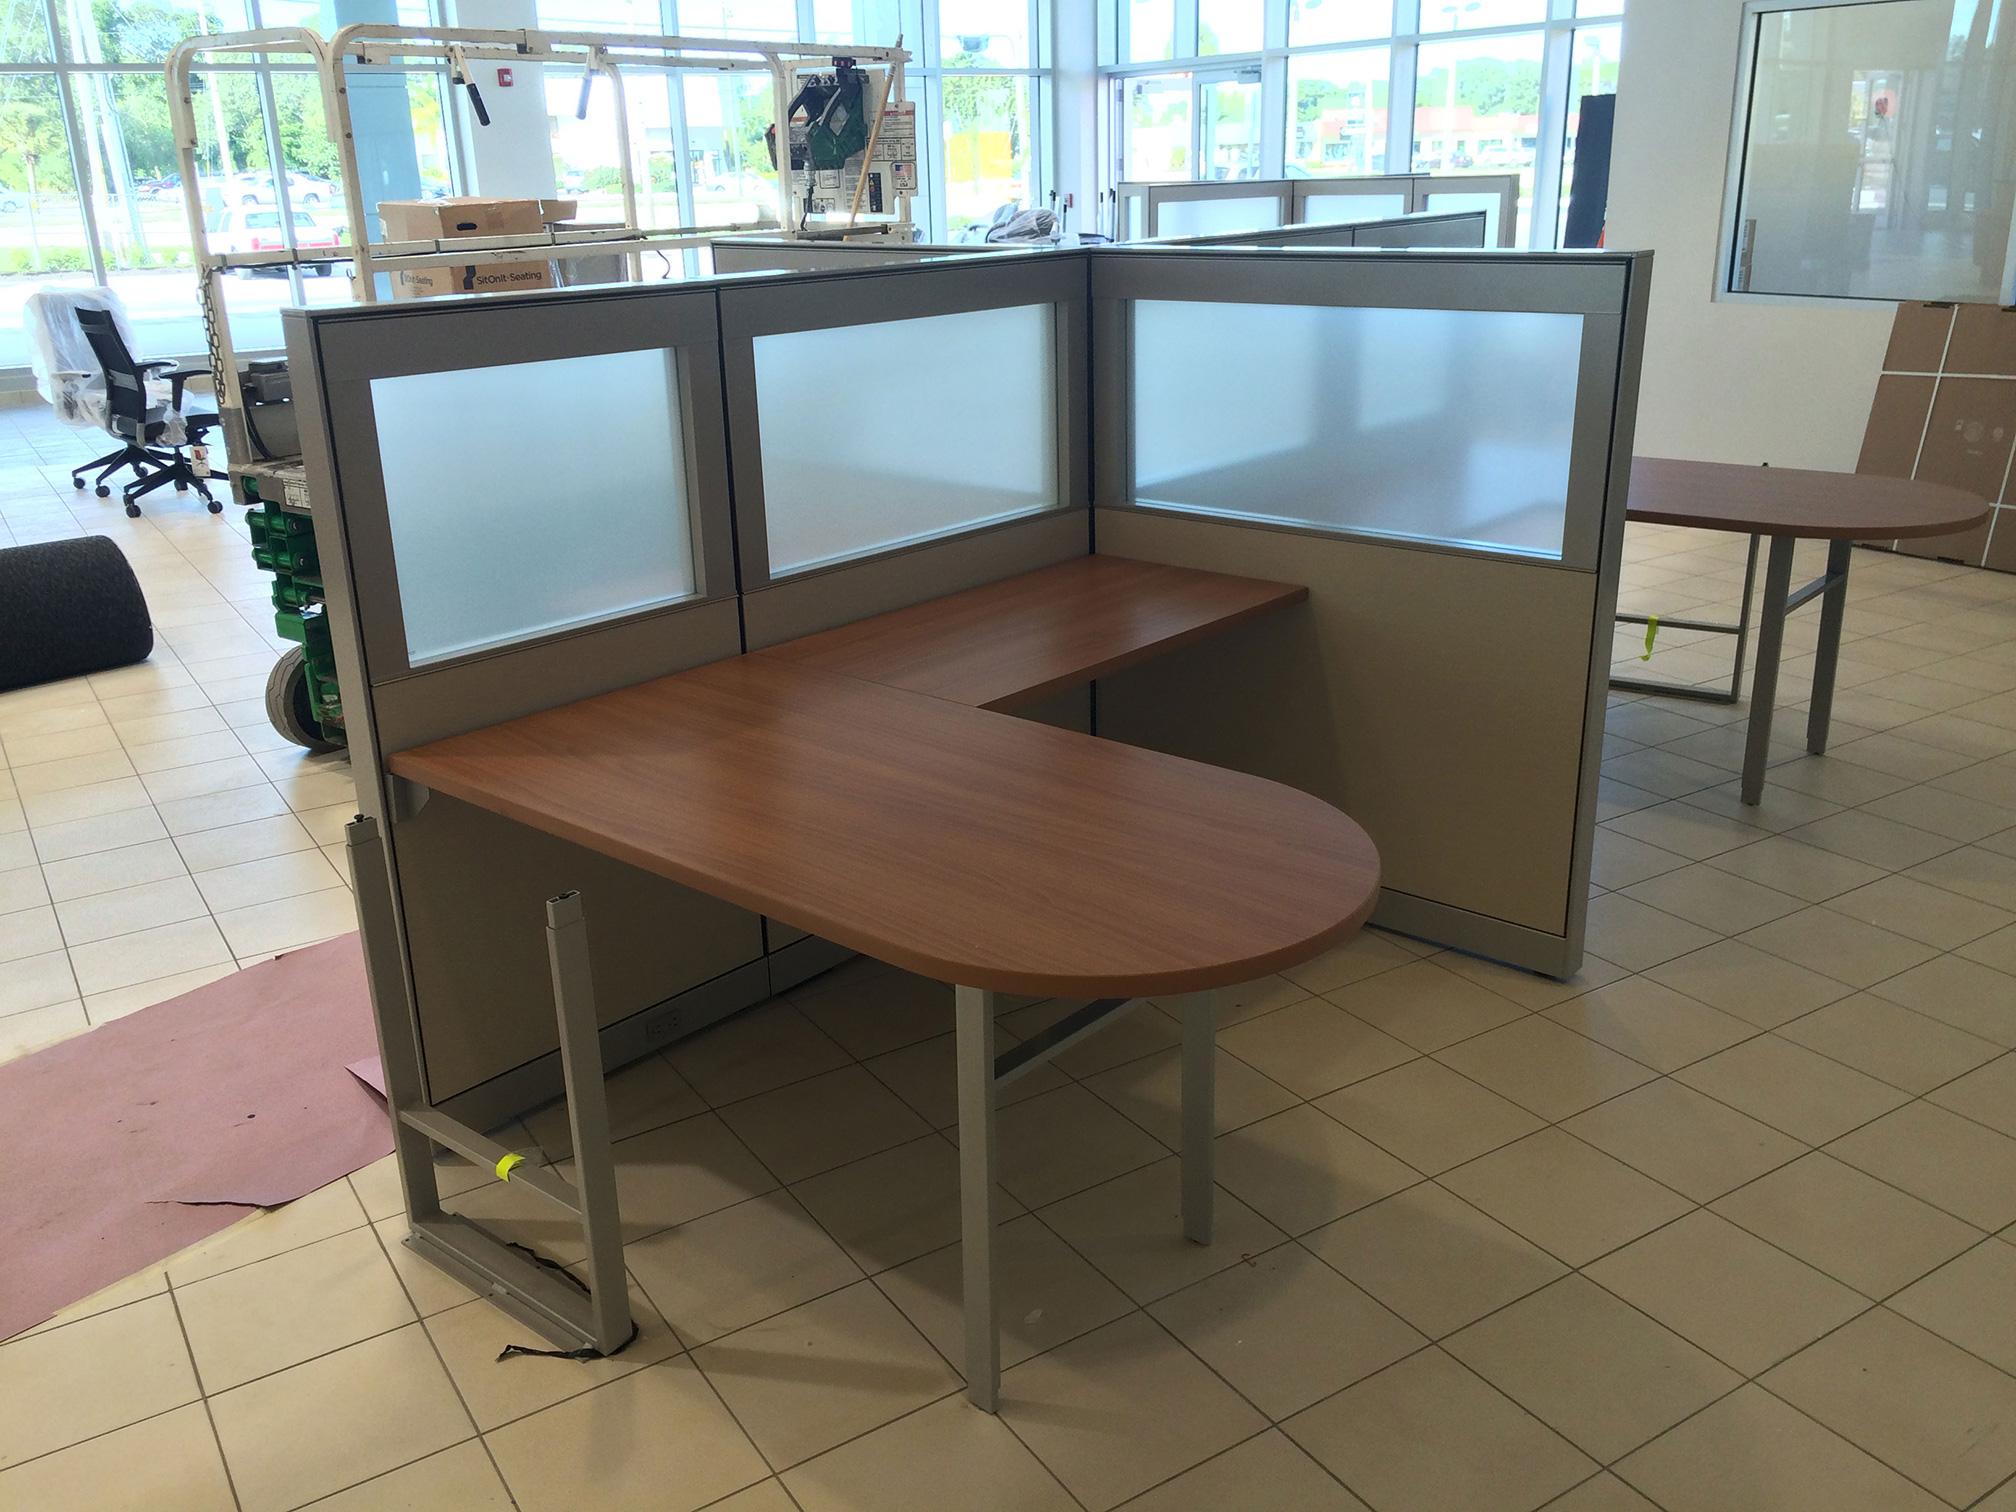 office-cubicles-for-sale-in-defuniak-springs-florida-3-2.jpg